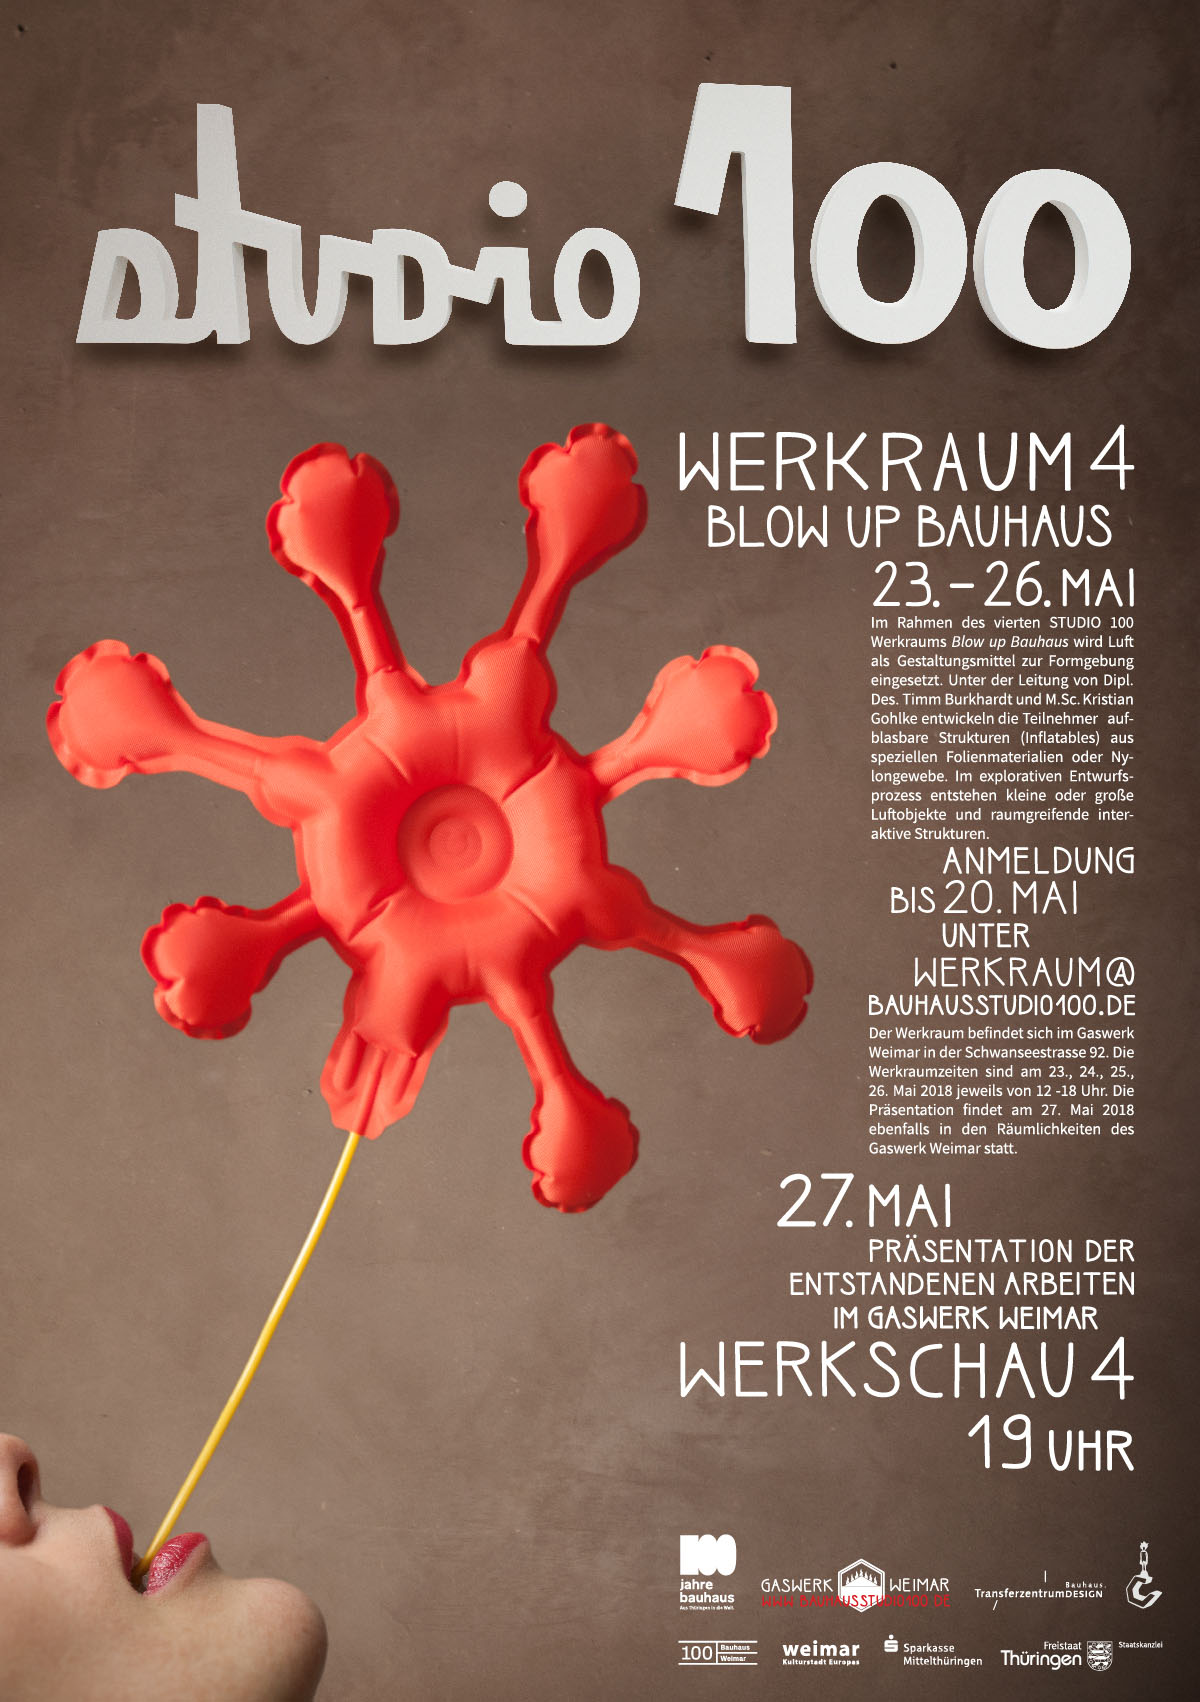 Bauhaus Studio 100 – Werkraum 4: Blow up Bauhaus ...